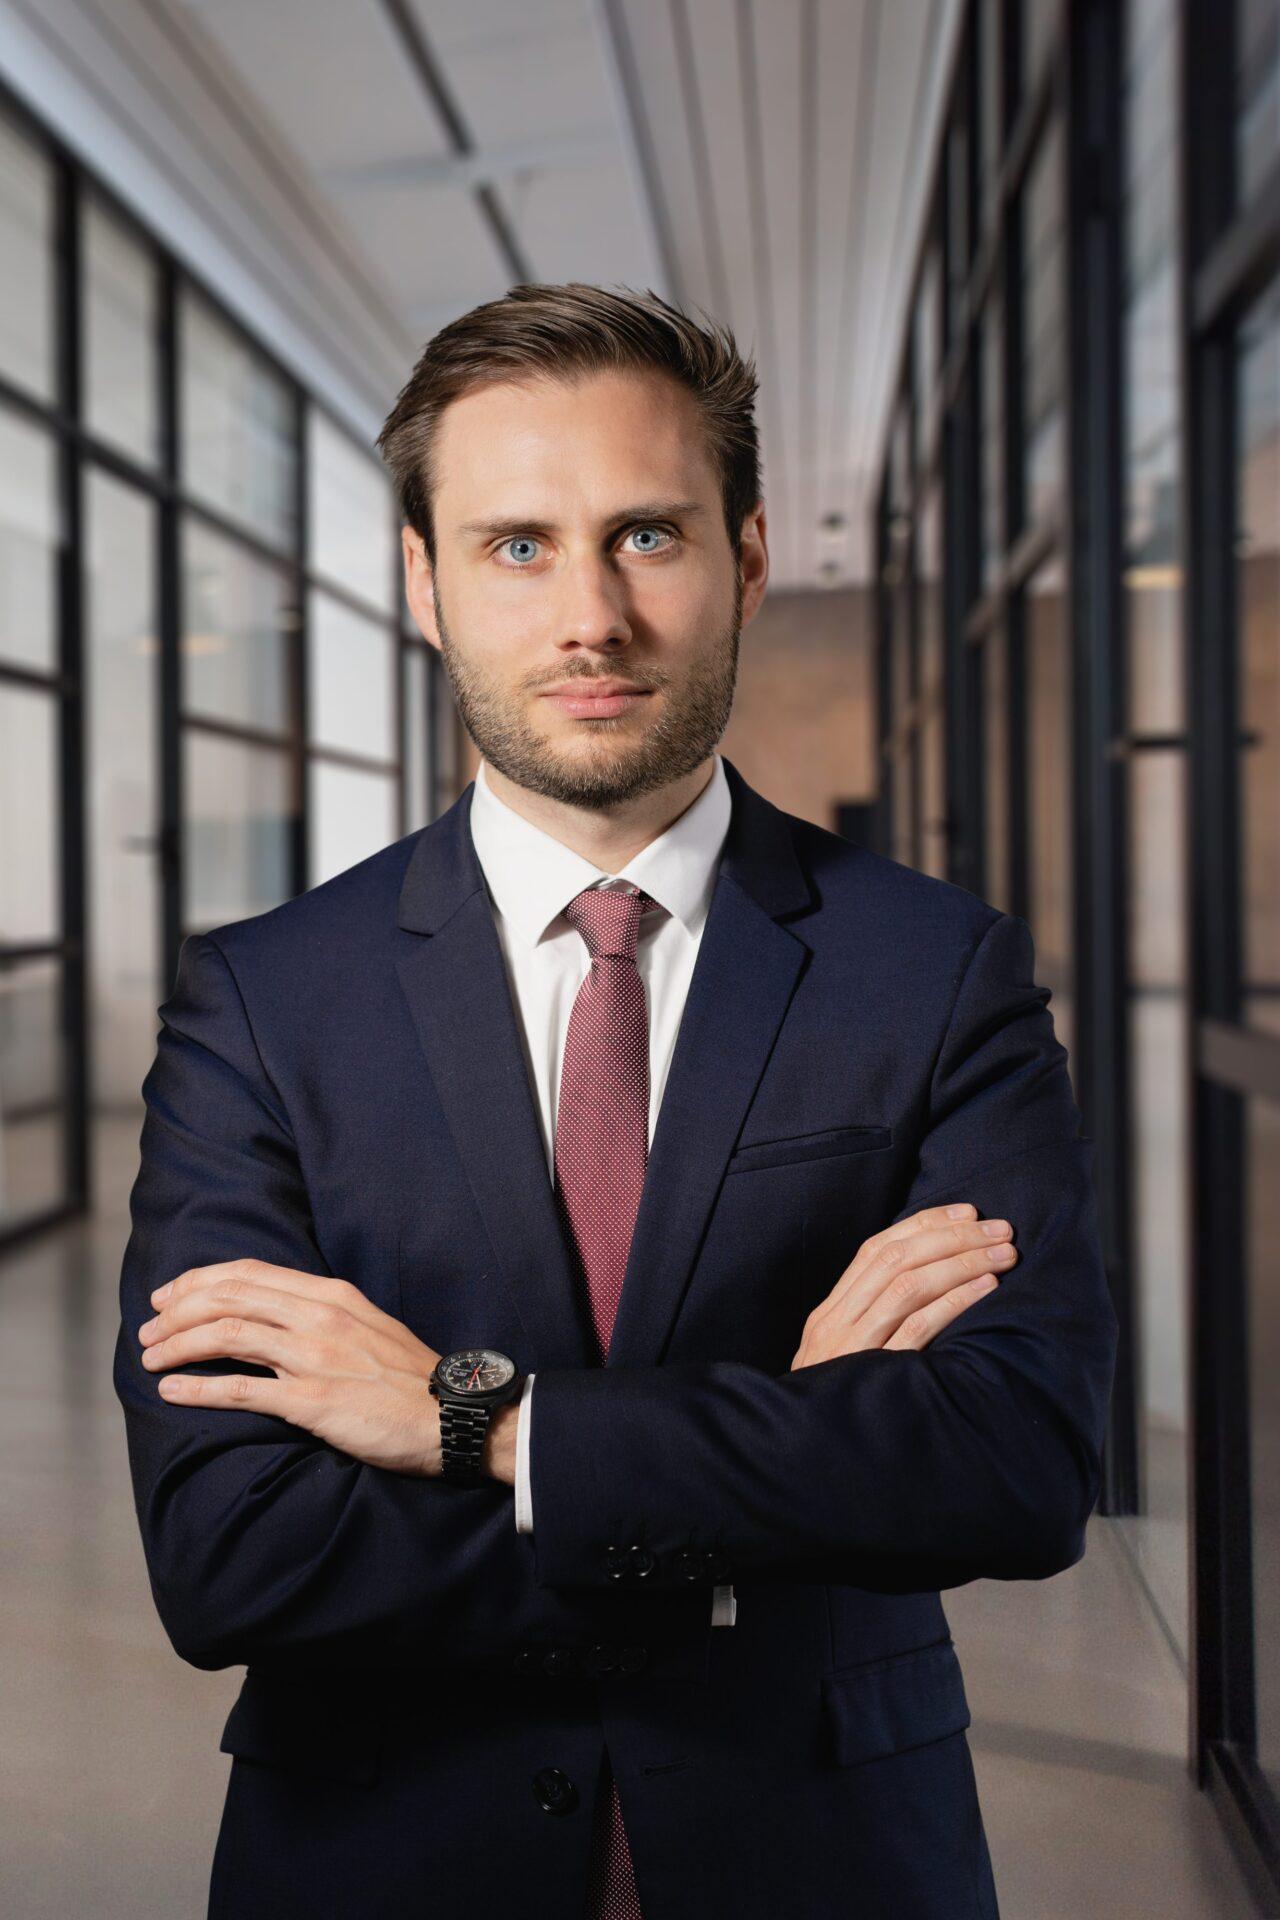 https://intelligent-investors.de/wp-content/uploads/2020/05/Quest_Personalie-1280x1920.jpeg